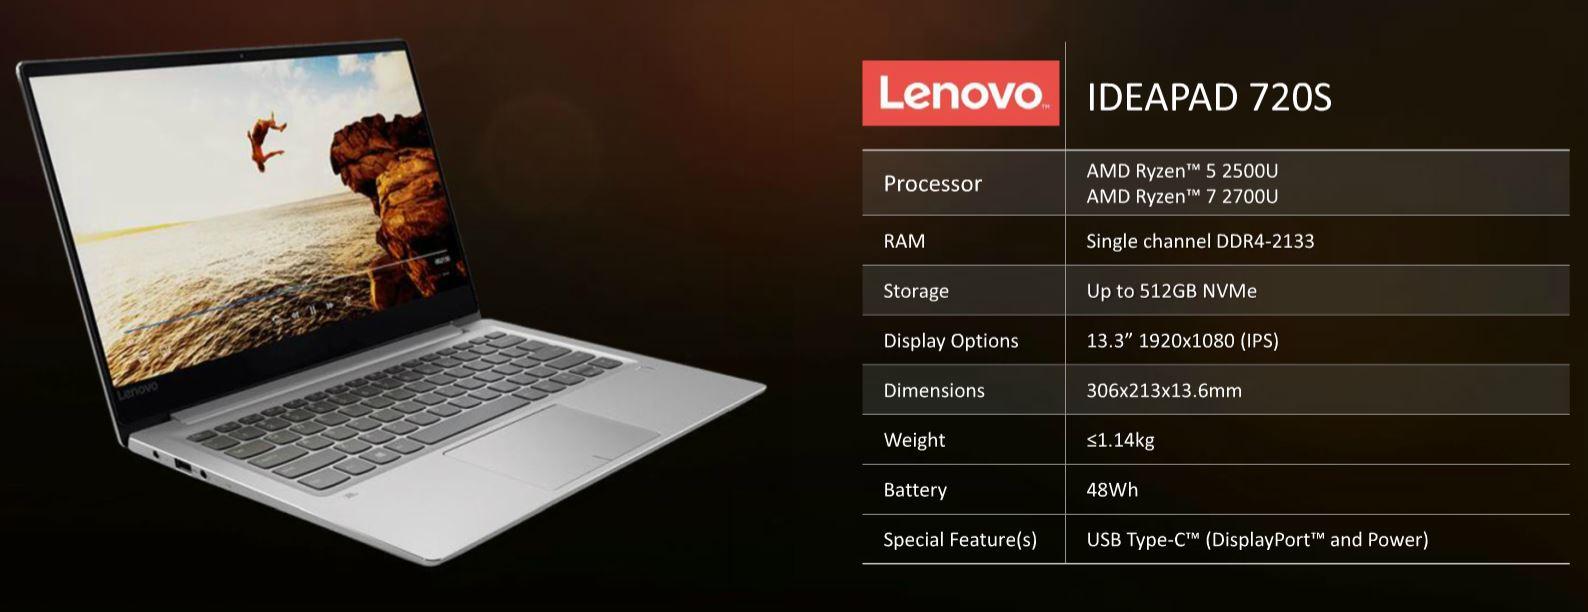 AMD Ryzen Mobile Lenovo IdeaPad 720S